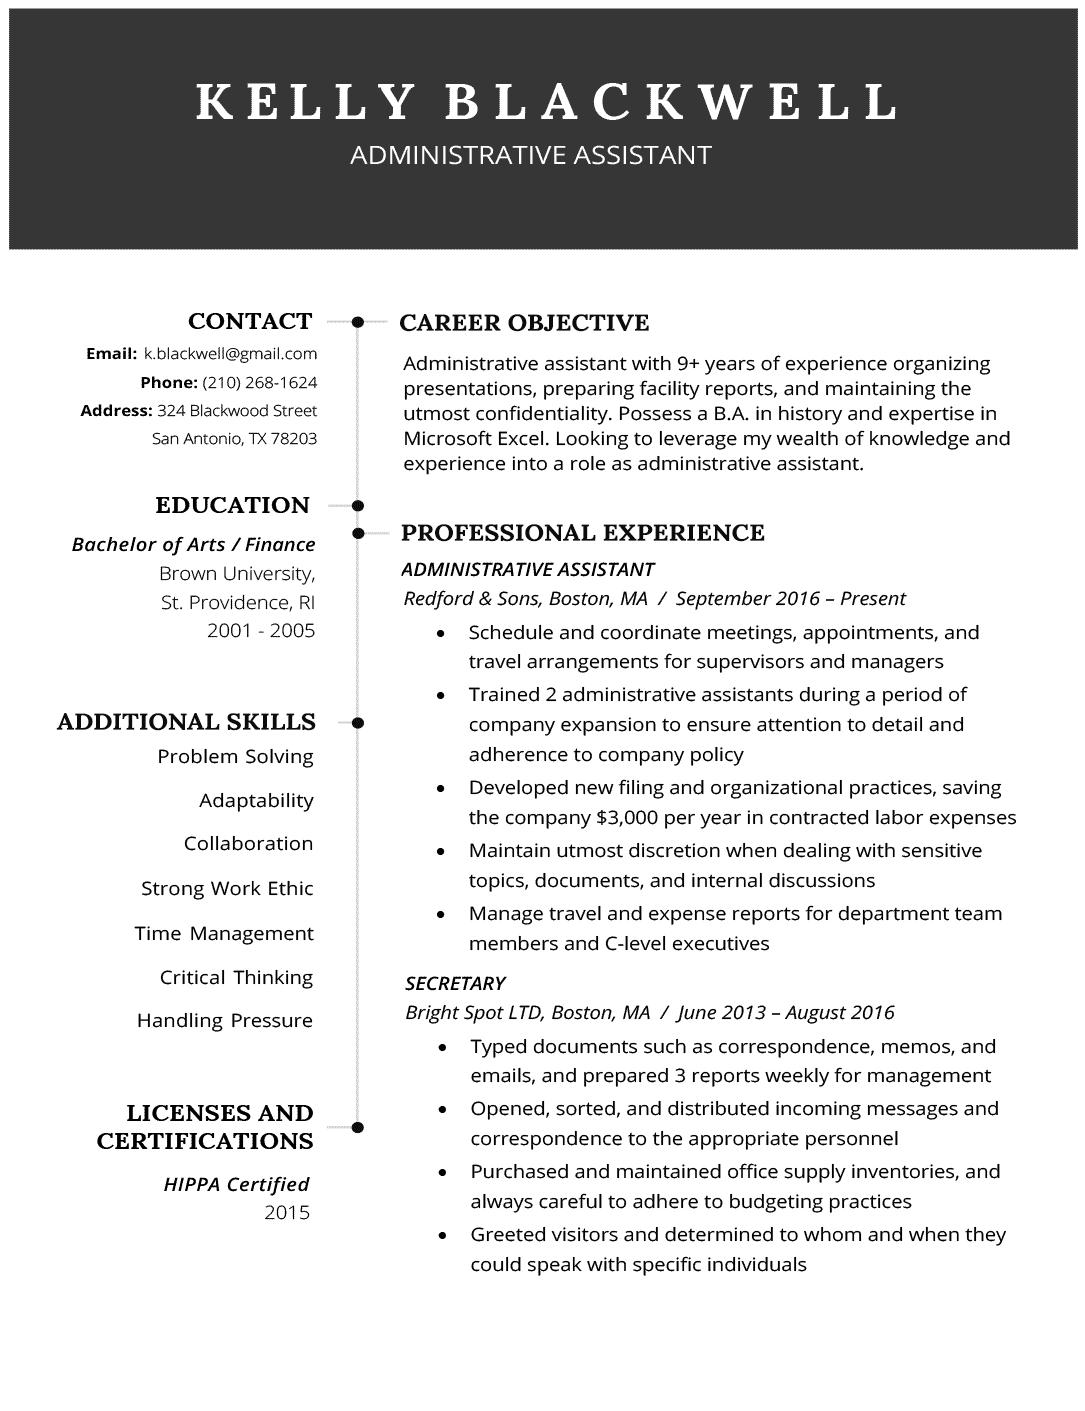 Resume Builder Resume Builder Free Resume Builder Resume